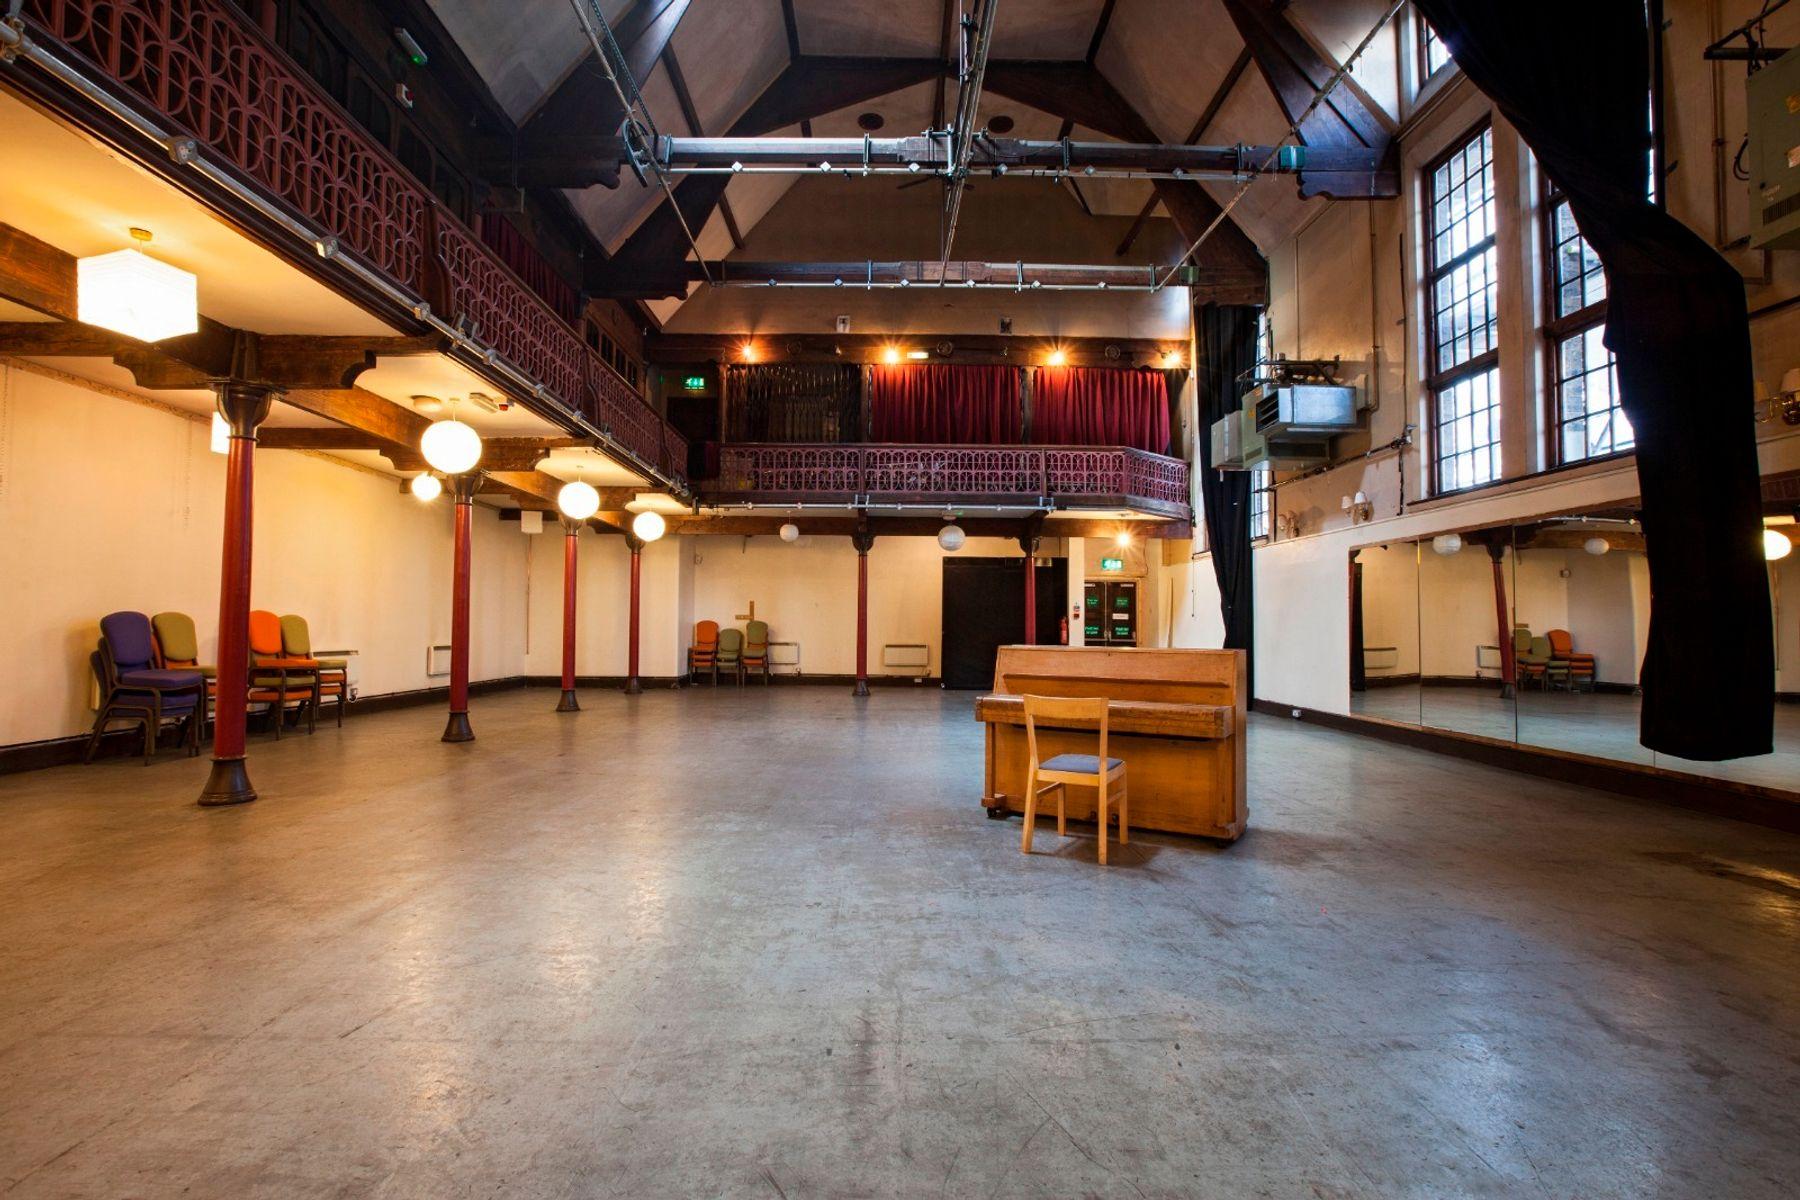 Union Chapel - Sunday School Hall